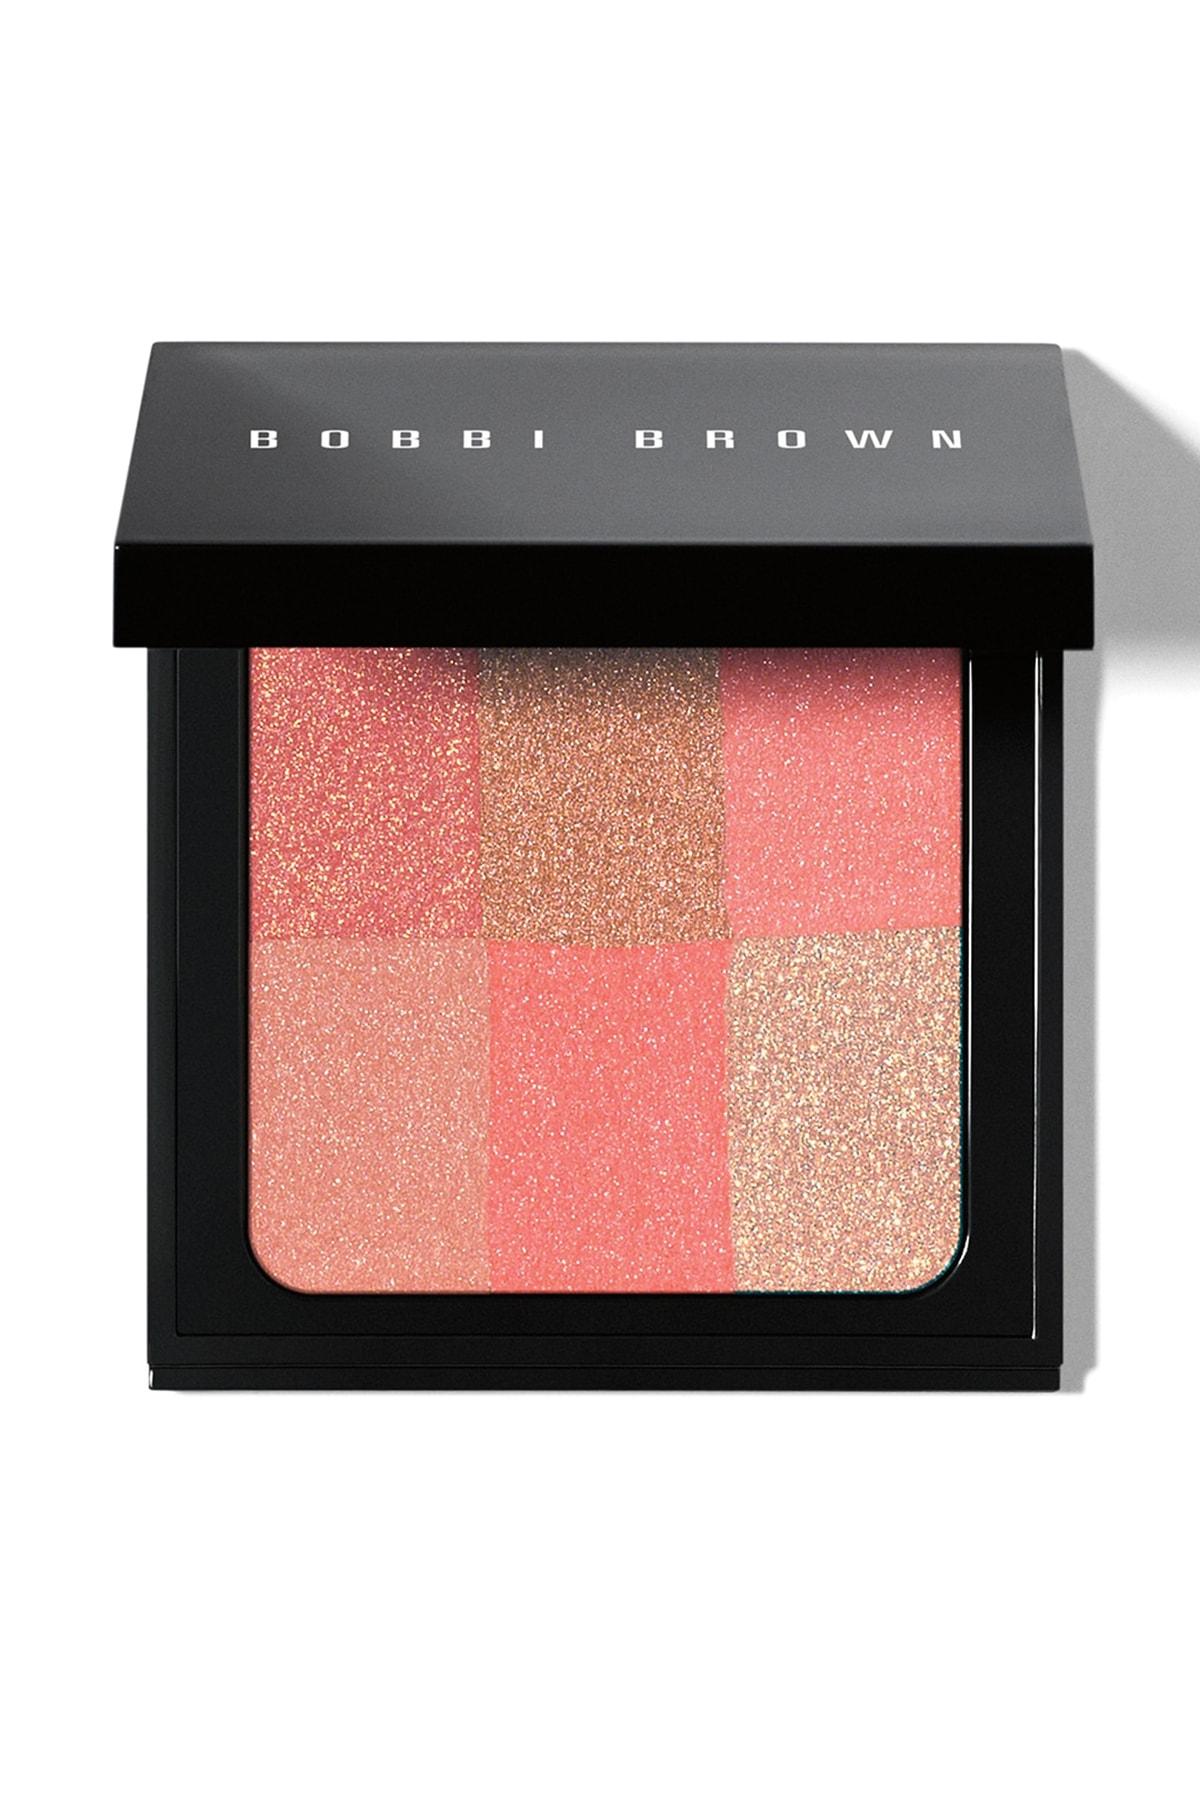 BOBBI BROWN Aydınlatıcı - Brightening Brick Coral 6.6 g 716170144115